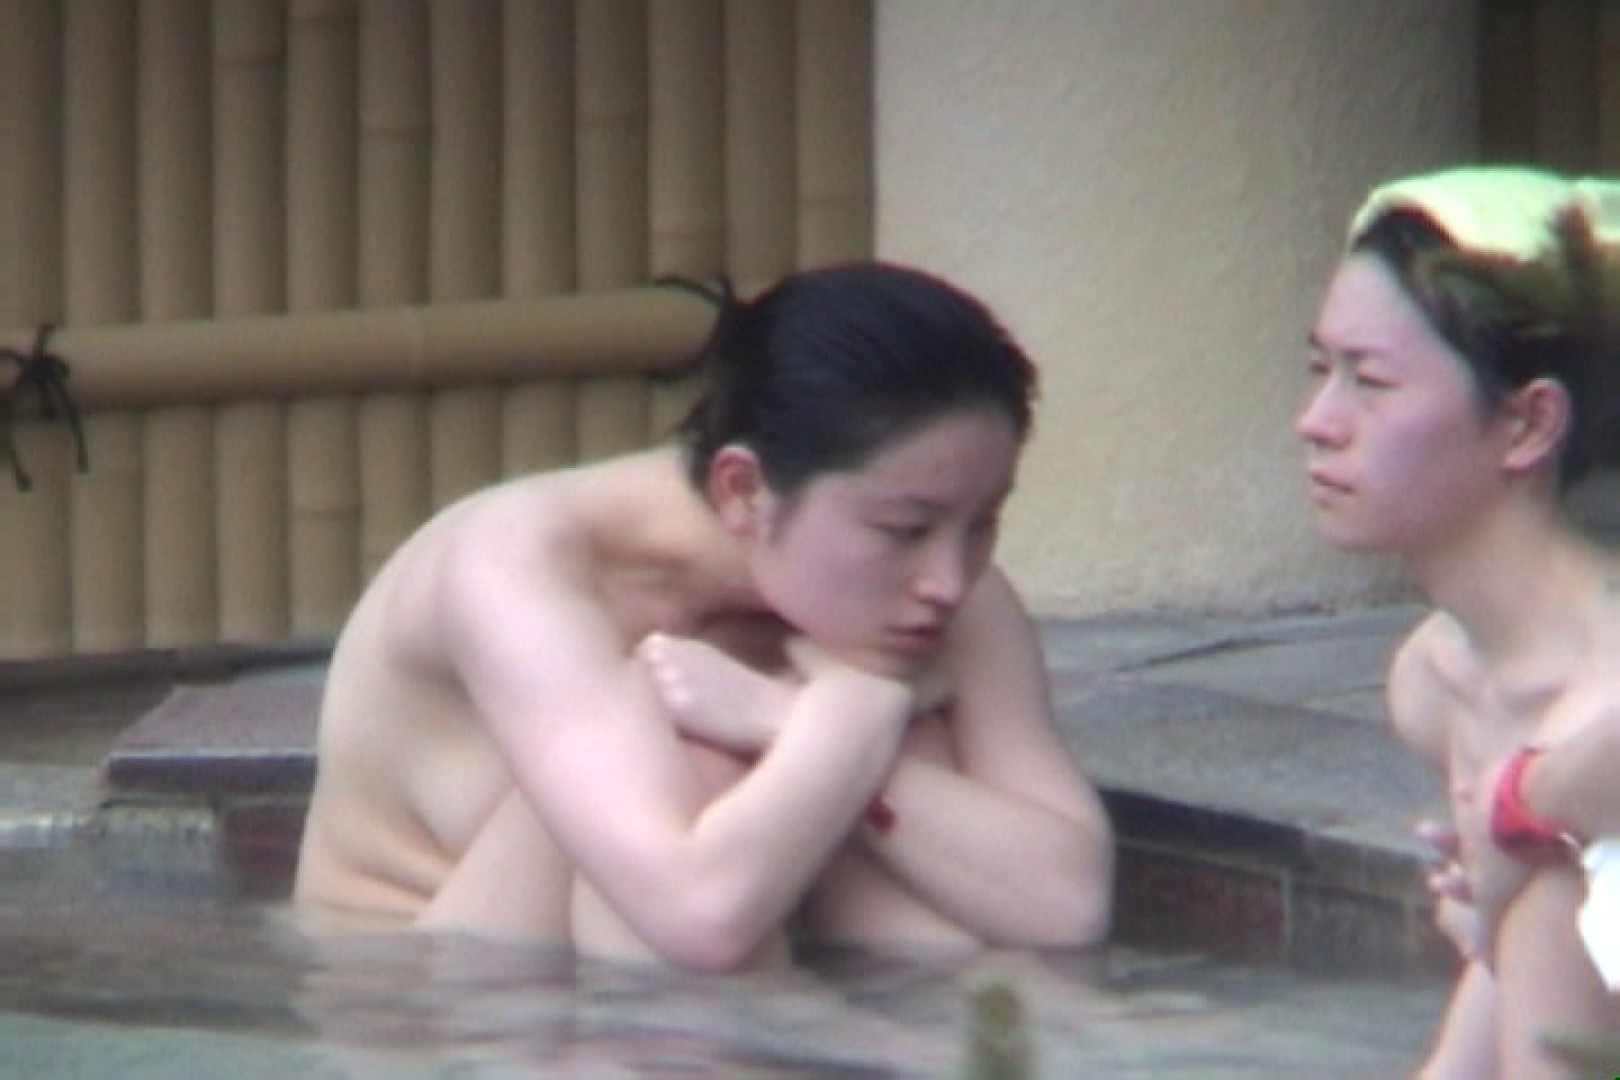 Aquaな露天風呂Vol.45【VIP限定】 HなOL   盗撮  100pic 3